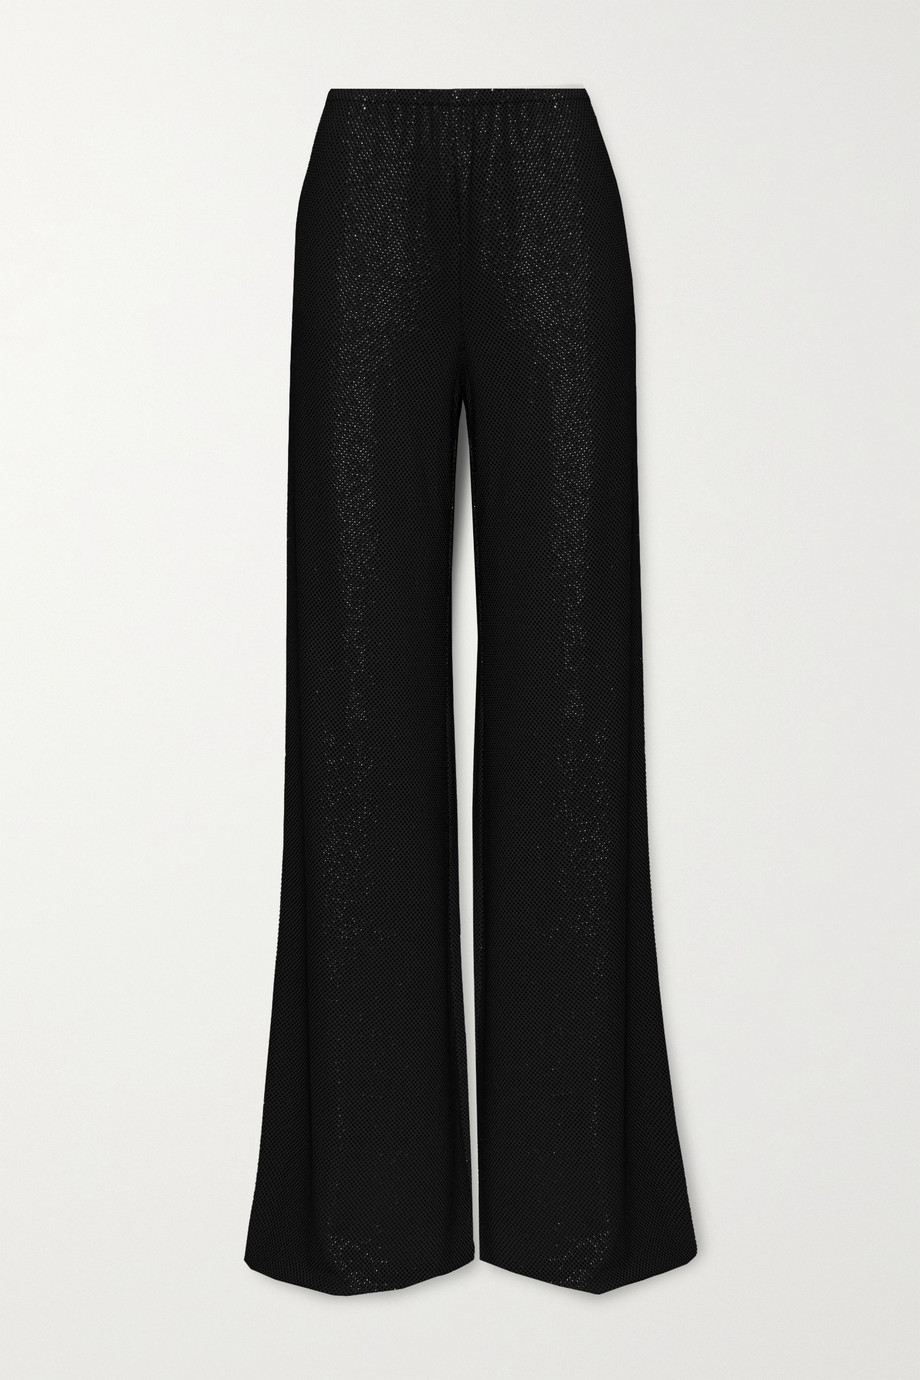 Alexandre Vauthier Crystal-embellished stretch-jersey wide-leg pants